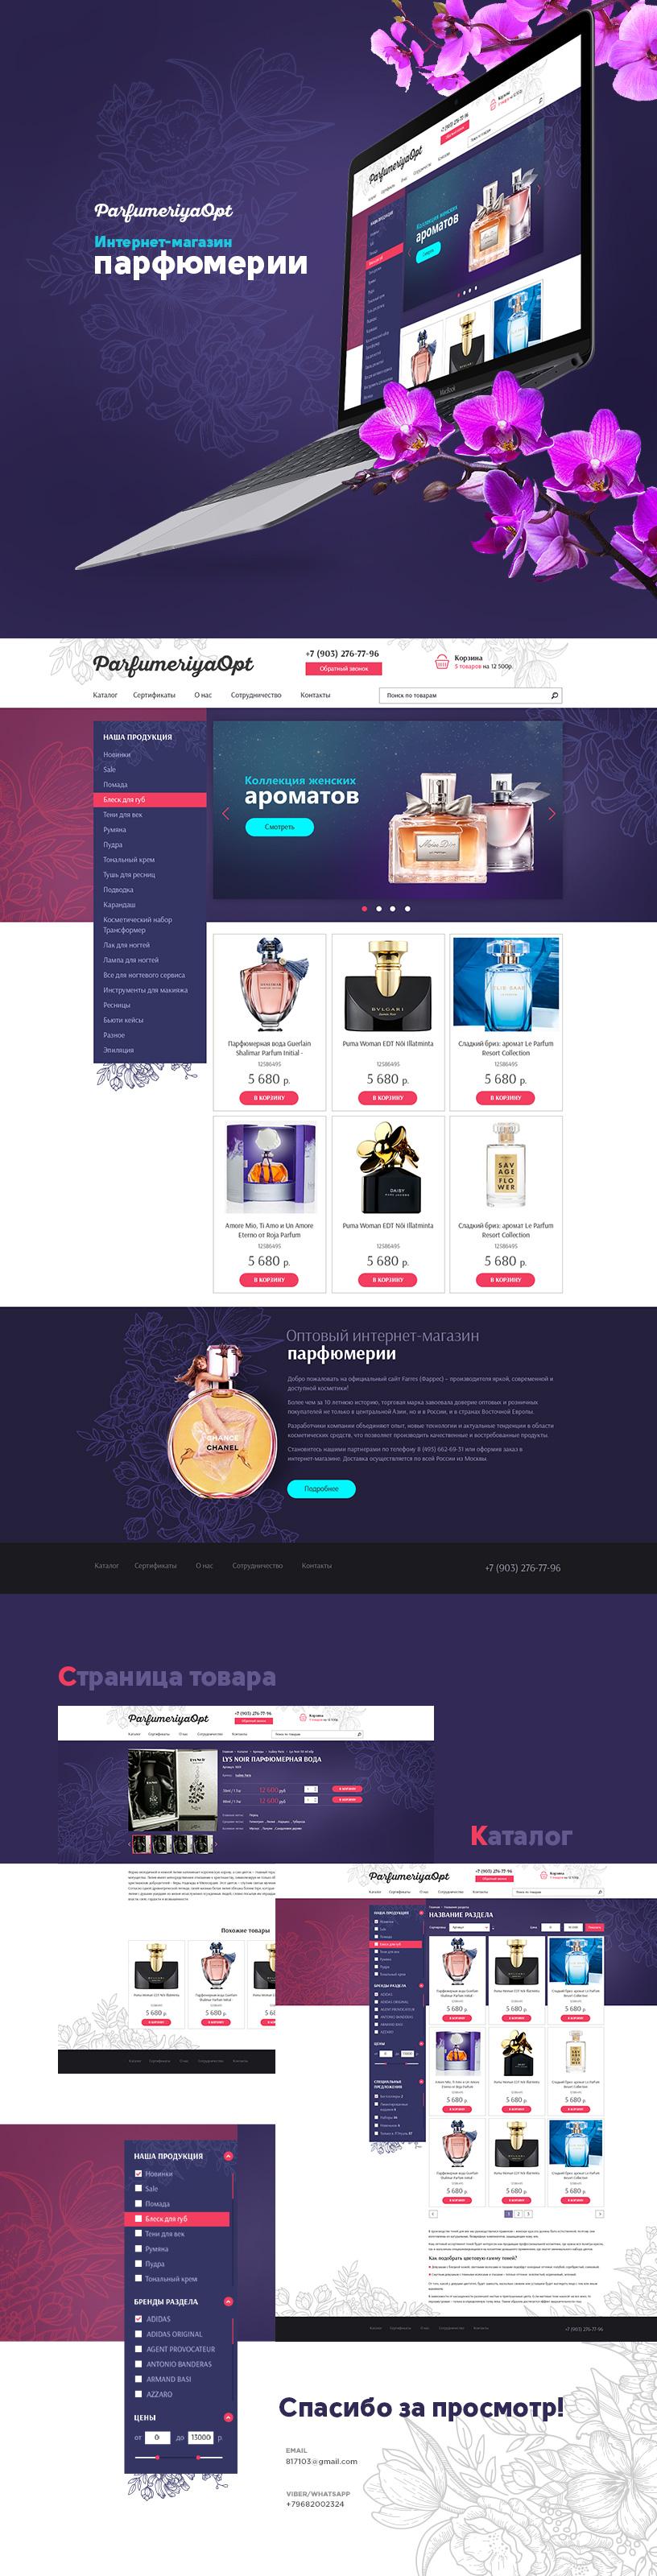 Дизайн интернет-магазина парфюмерии